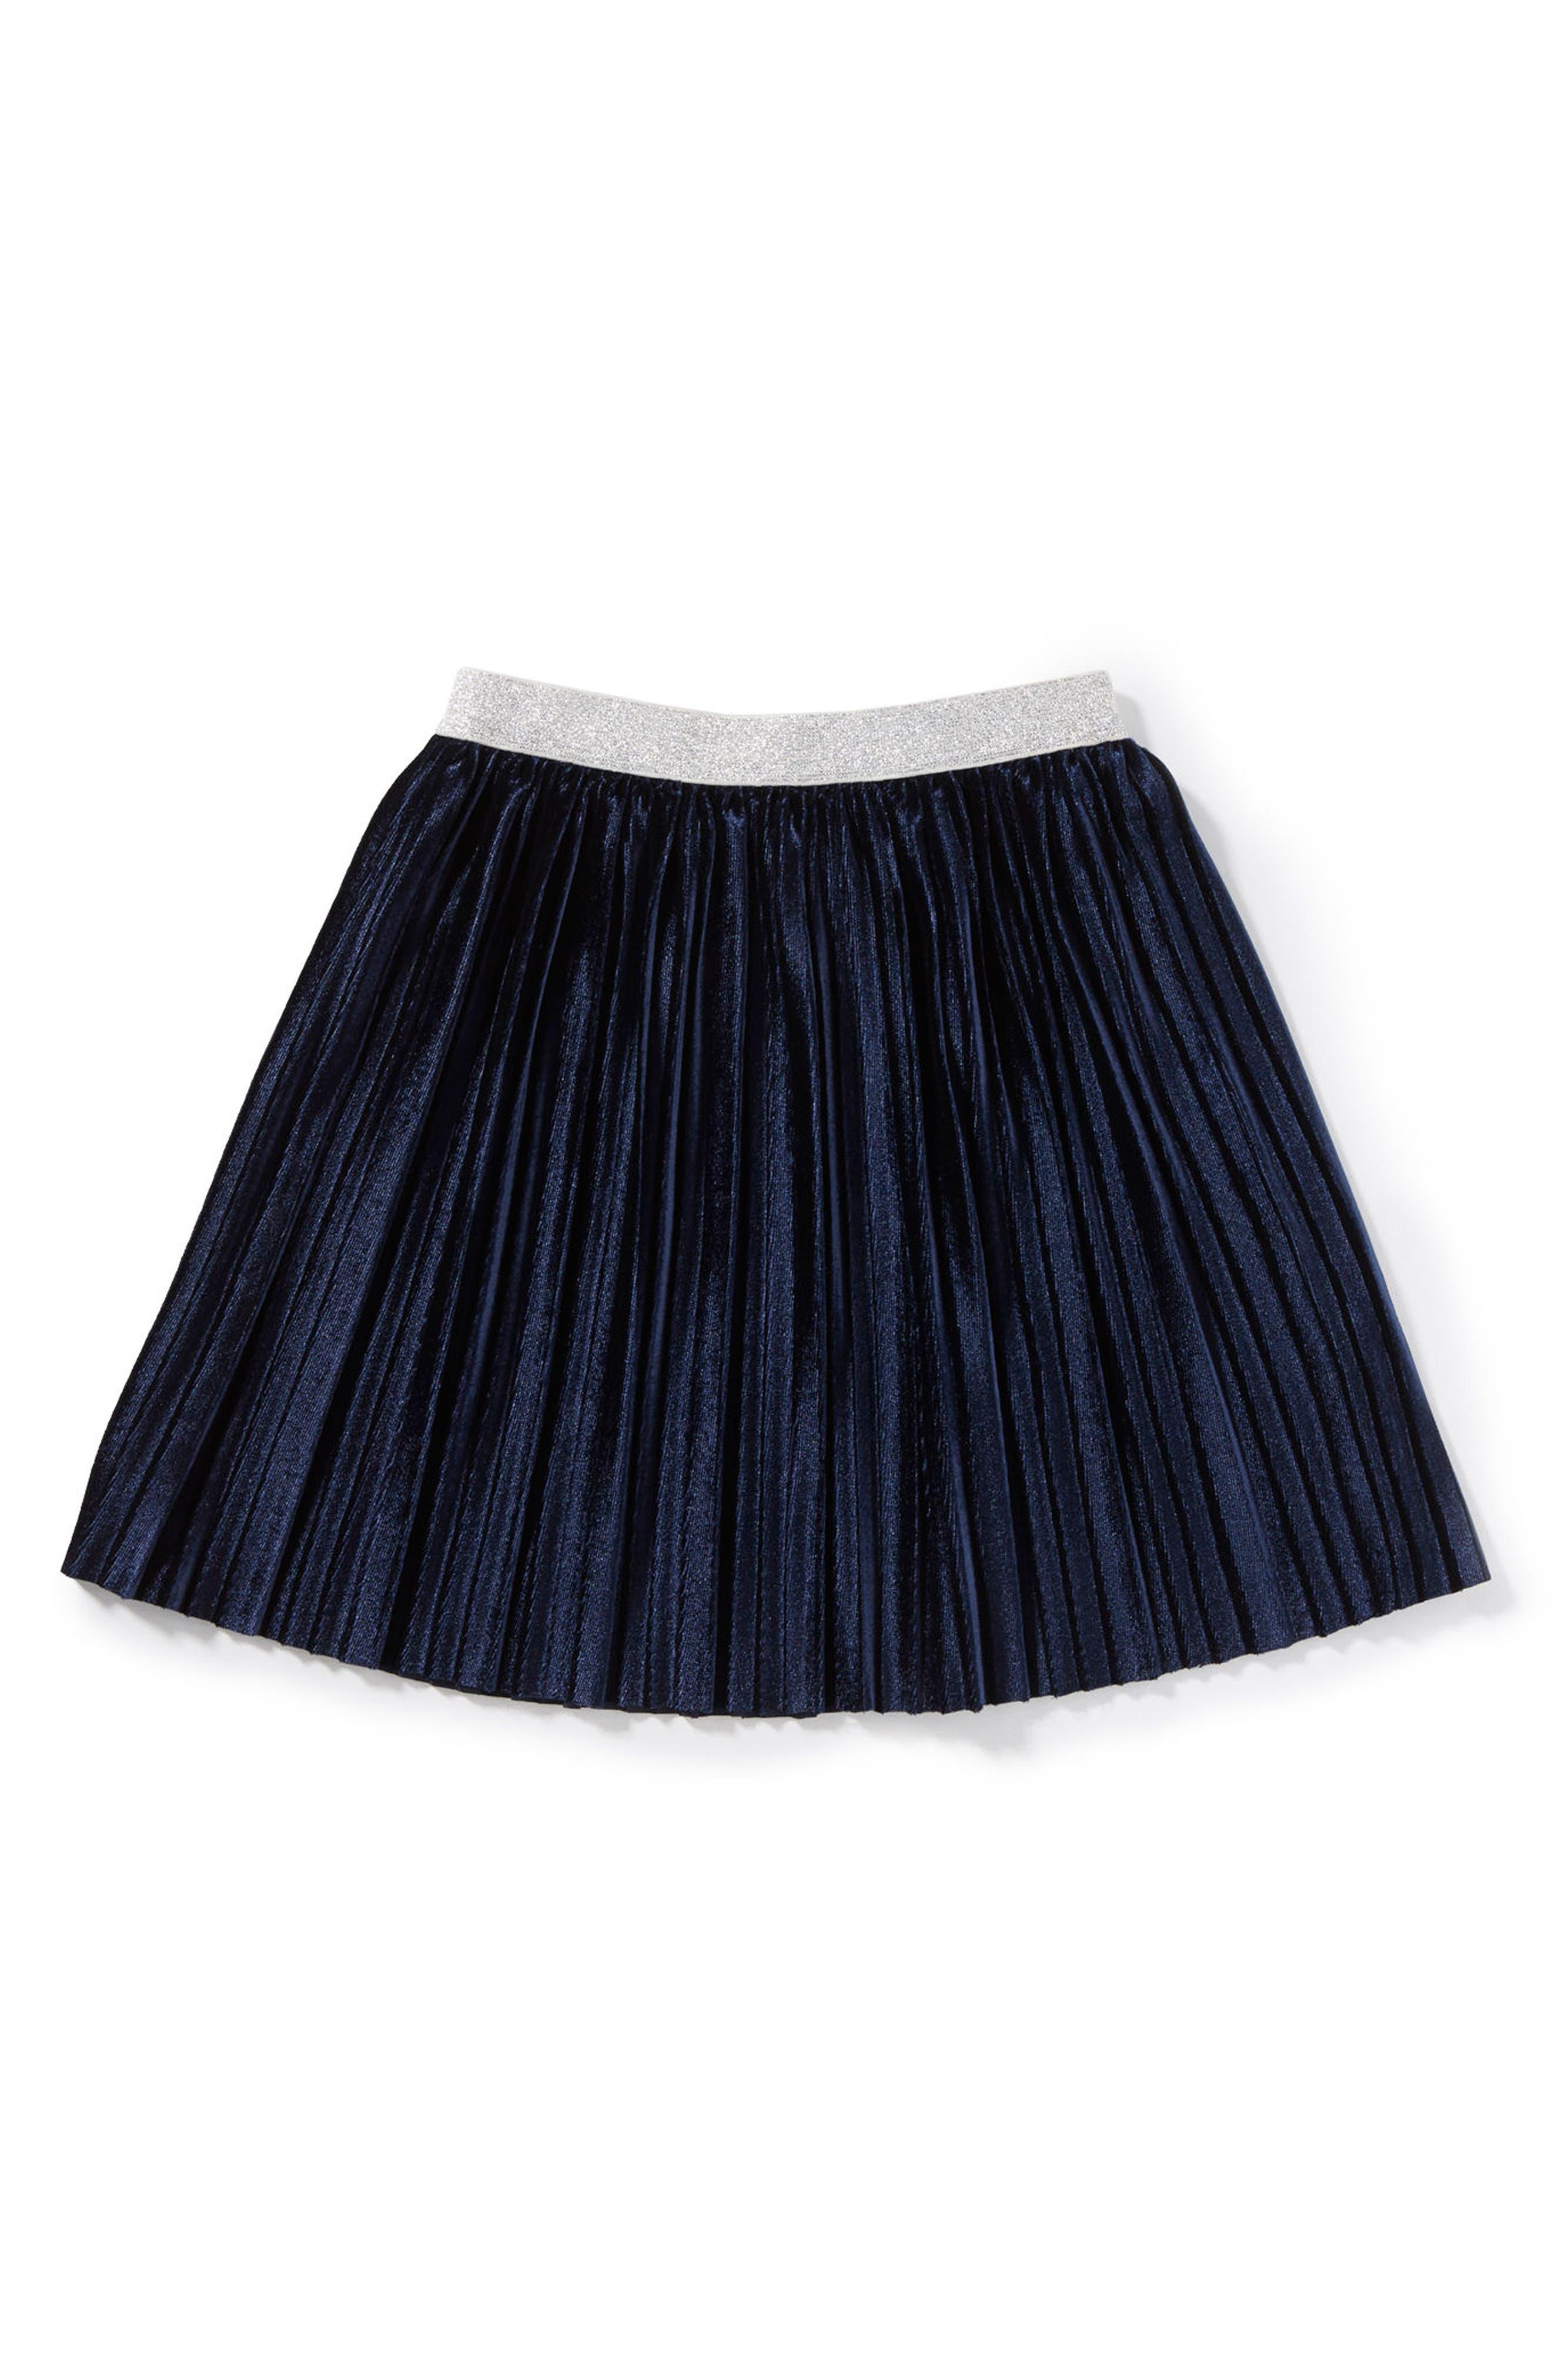 Marissa Pleated Skirt,                             Main thumbnail 1, color,                             410